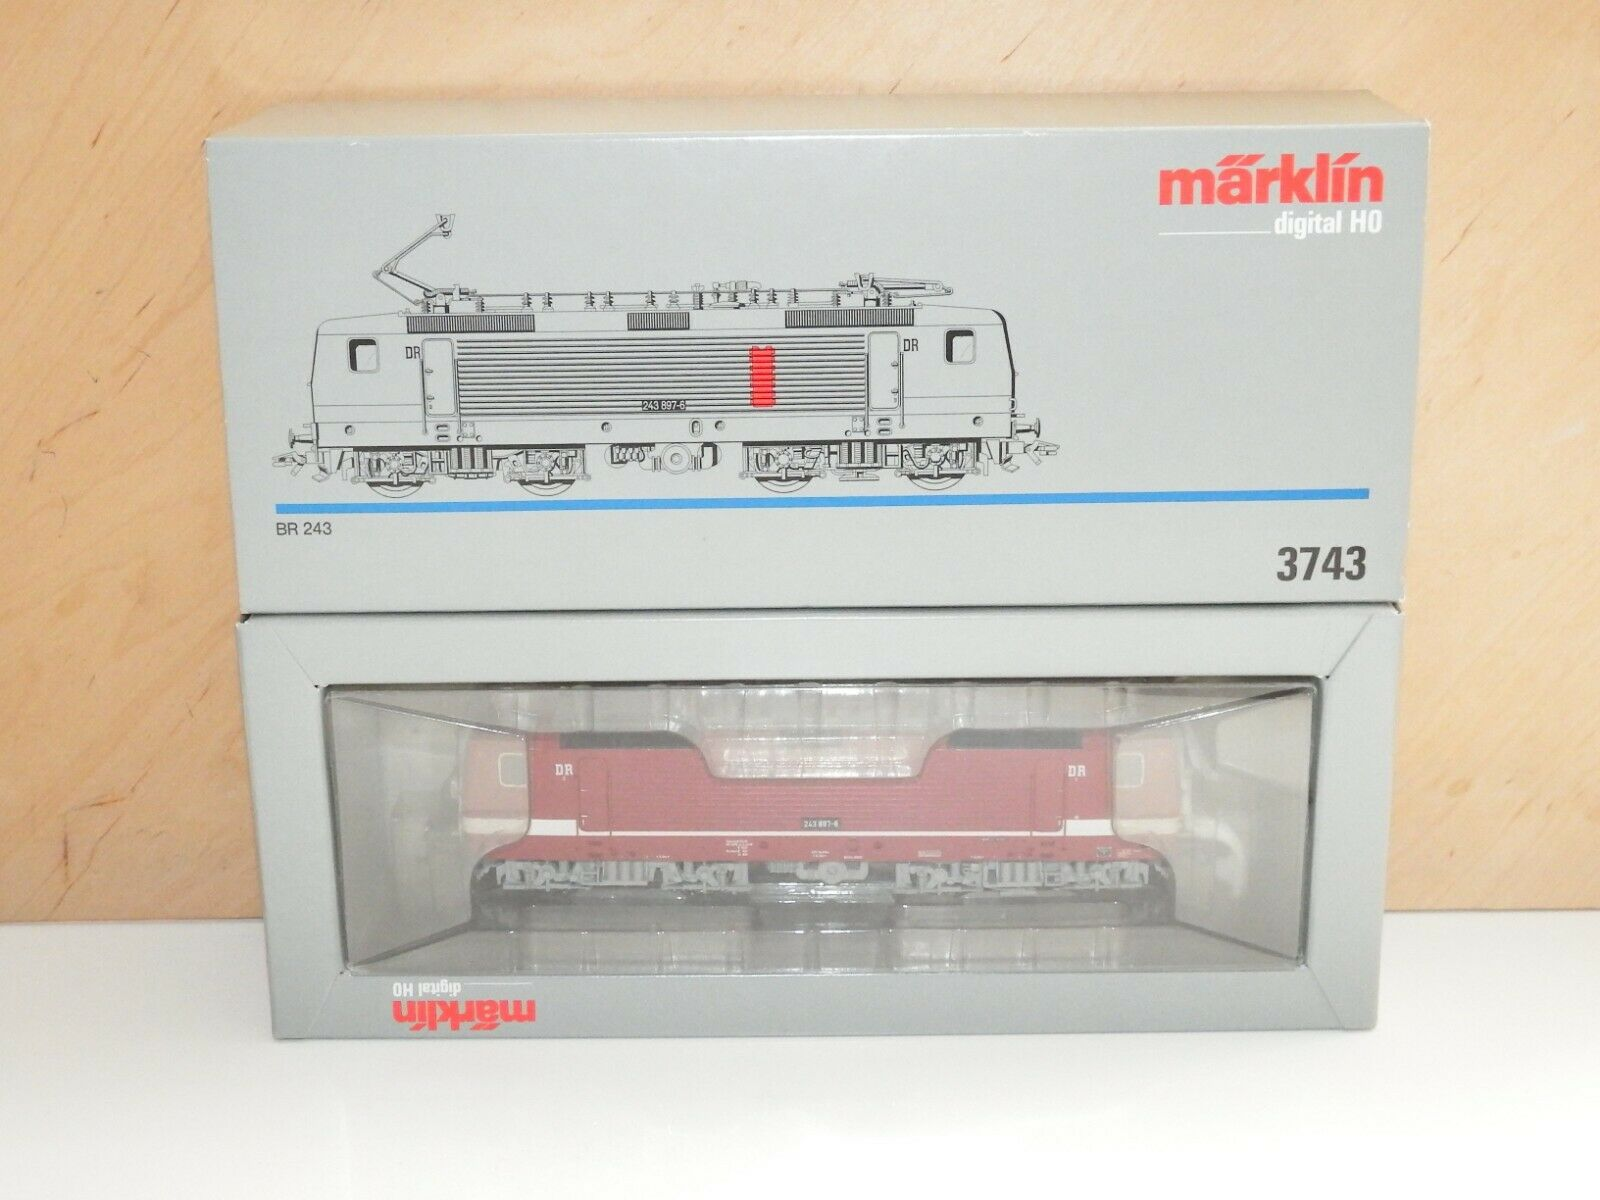 H0 3743 marklin Digital Elektrolok BR 243 DR MATTONCINI OVP 0872